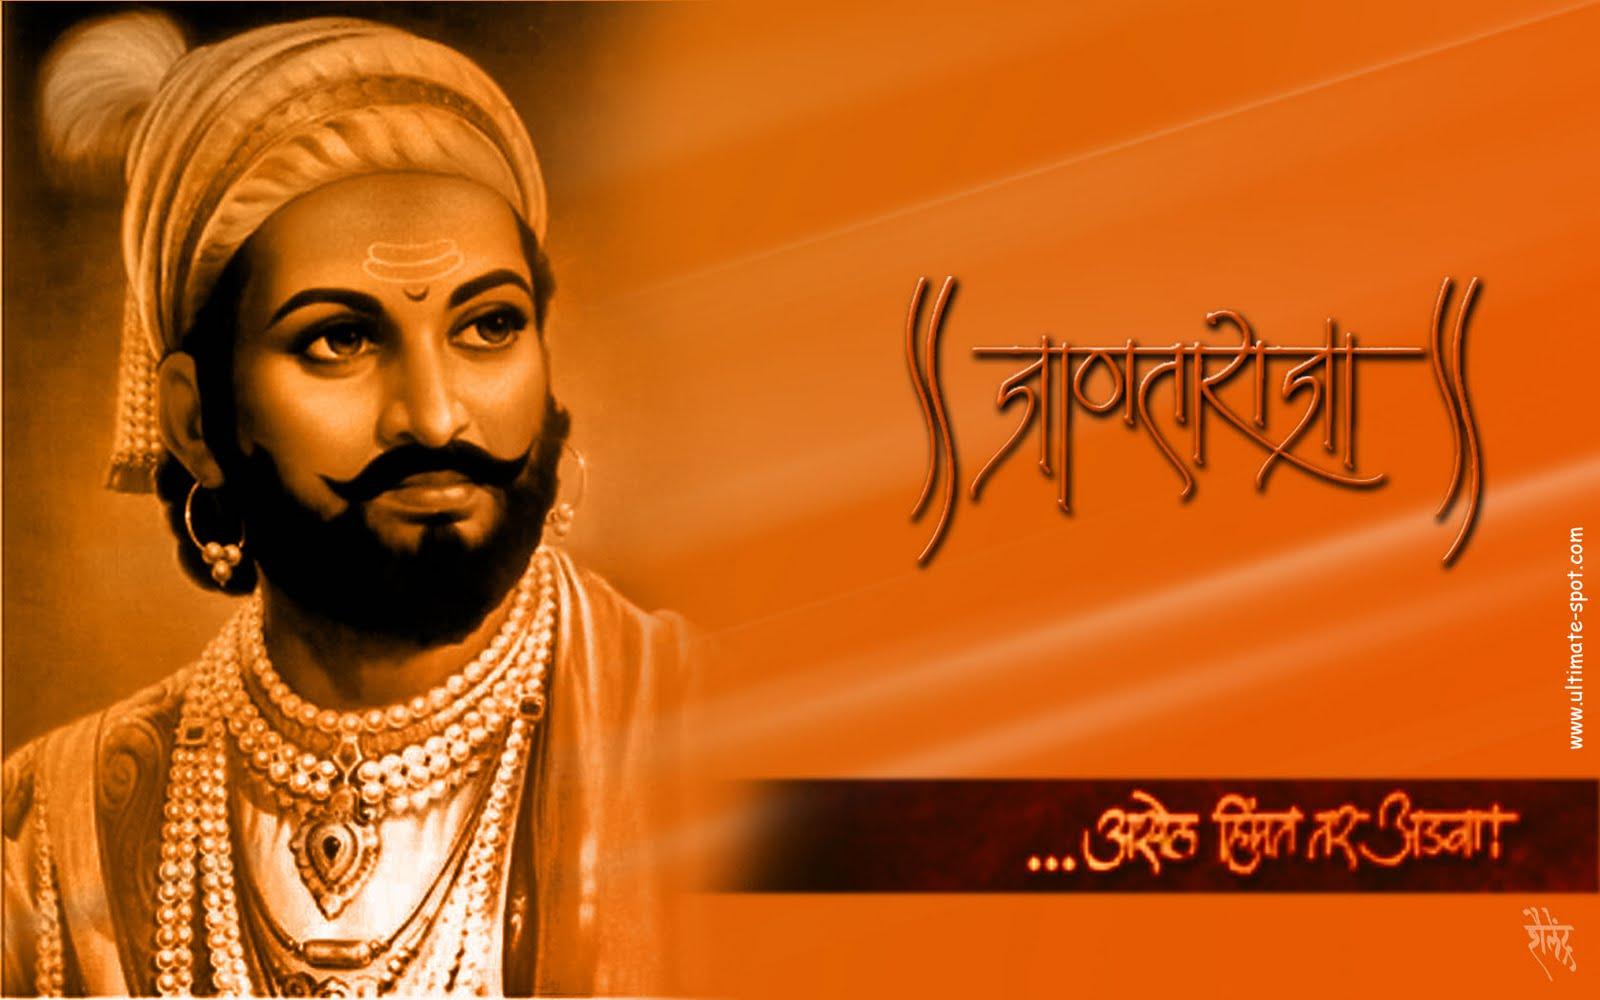 भारत की शान छत्रपति शिवाजी महाराज की जीवनी Chhatrapati Shivaji Biography in Hindi